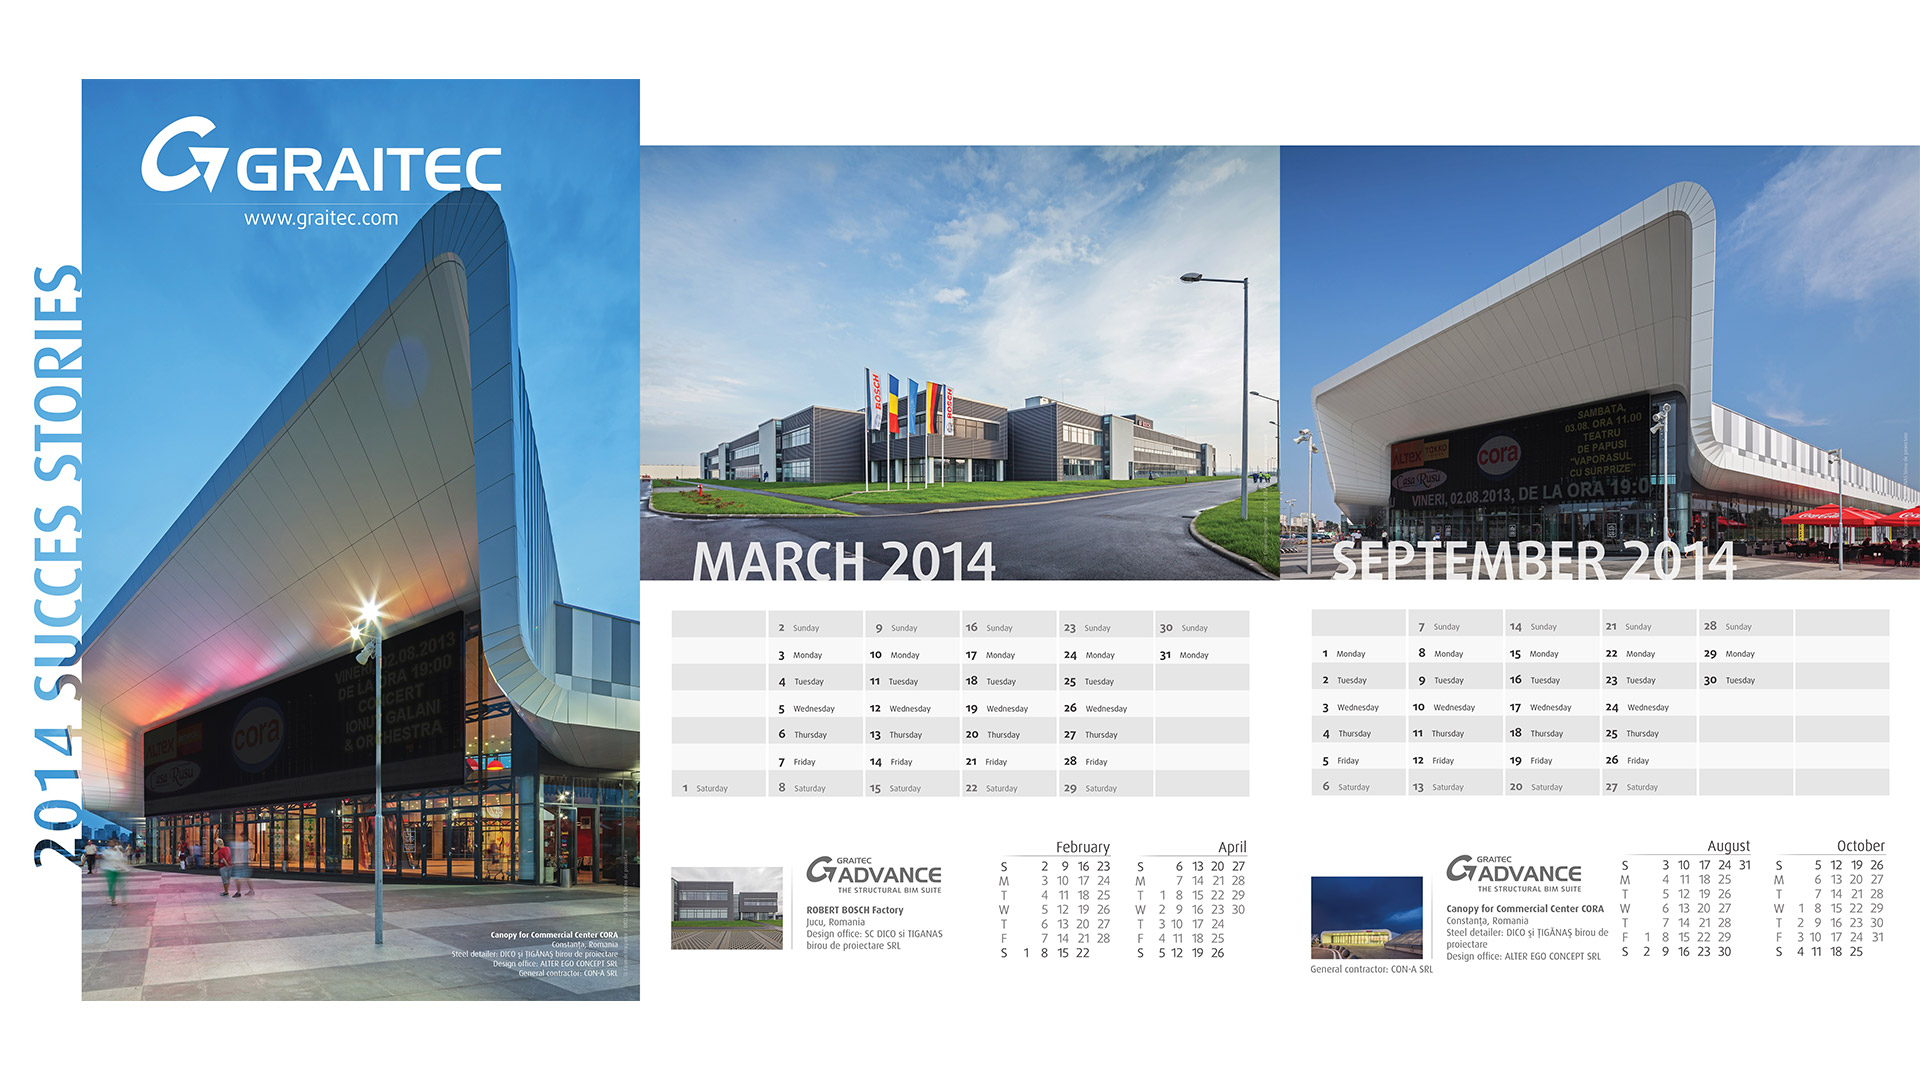 Calendarul Graitec, Centru Comercial Cora, Bosch, 2014